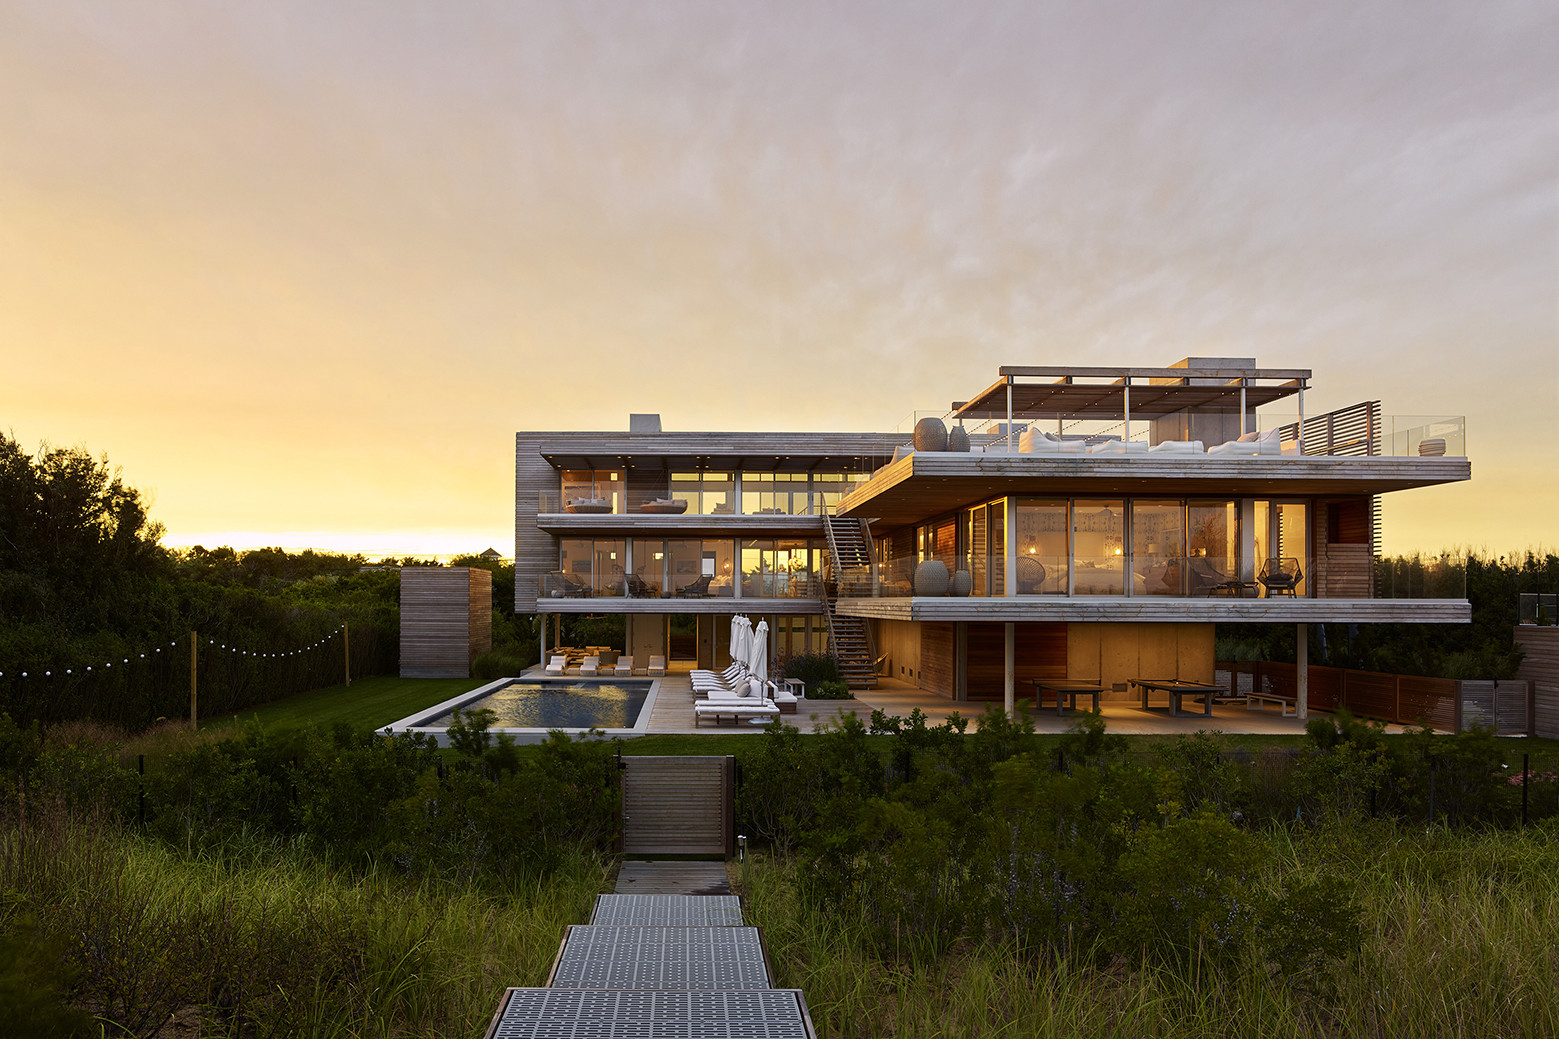 Casa con Terraza hacia el Océano / Stelle Lomont Rouhani Architects, © Matthew Carbone